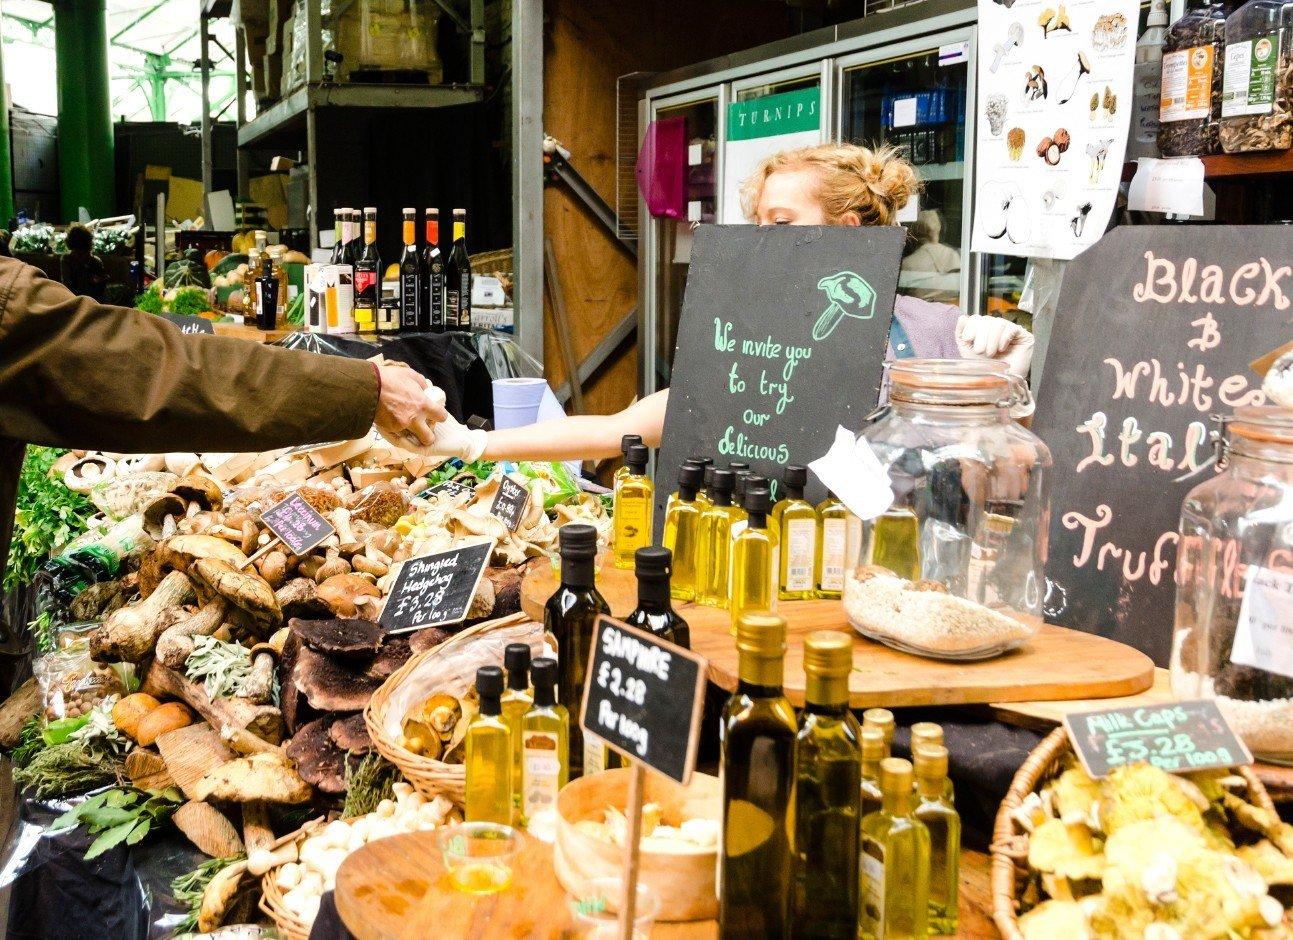 Budget food public space meal City marketplace human settlement brunch floristry market sense